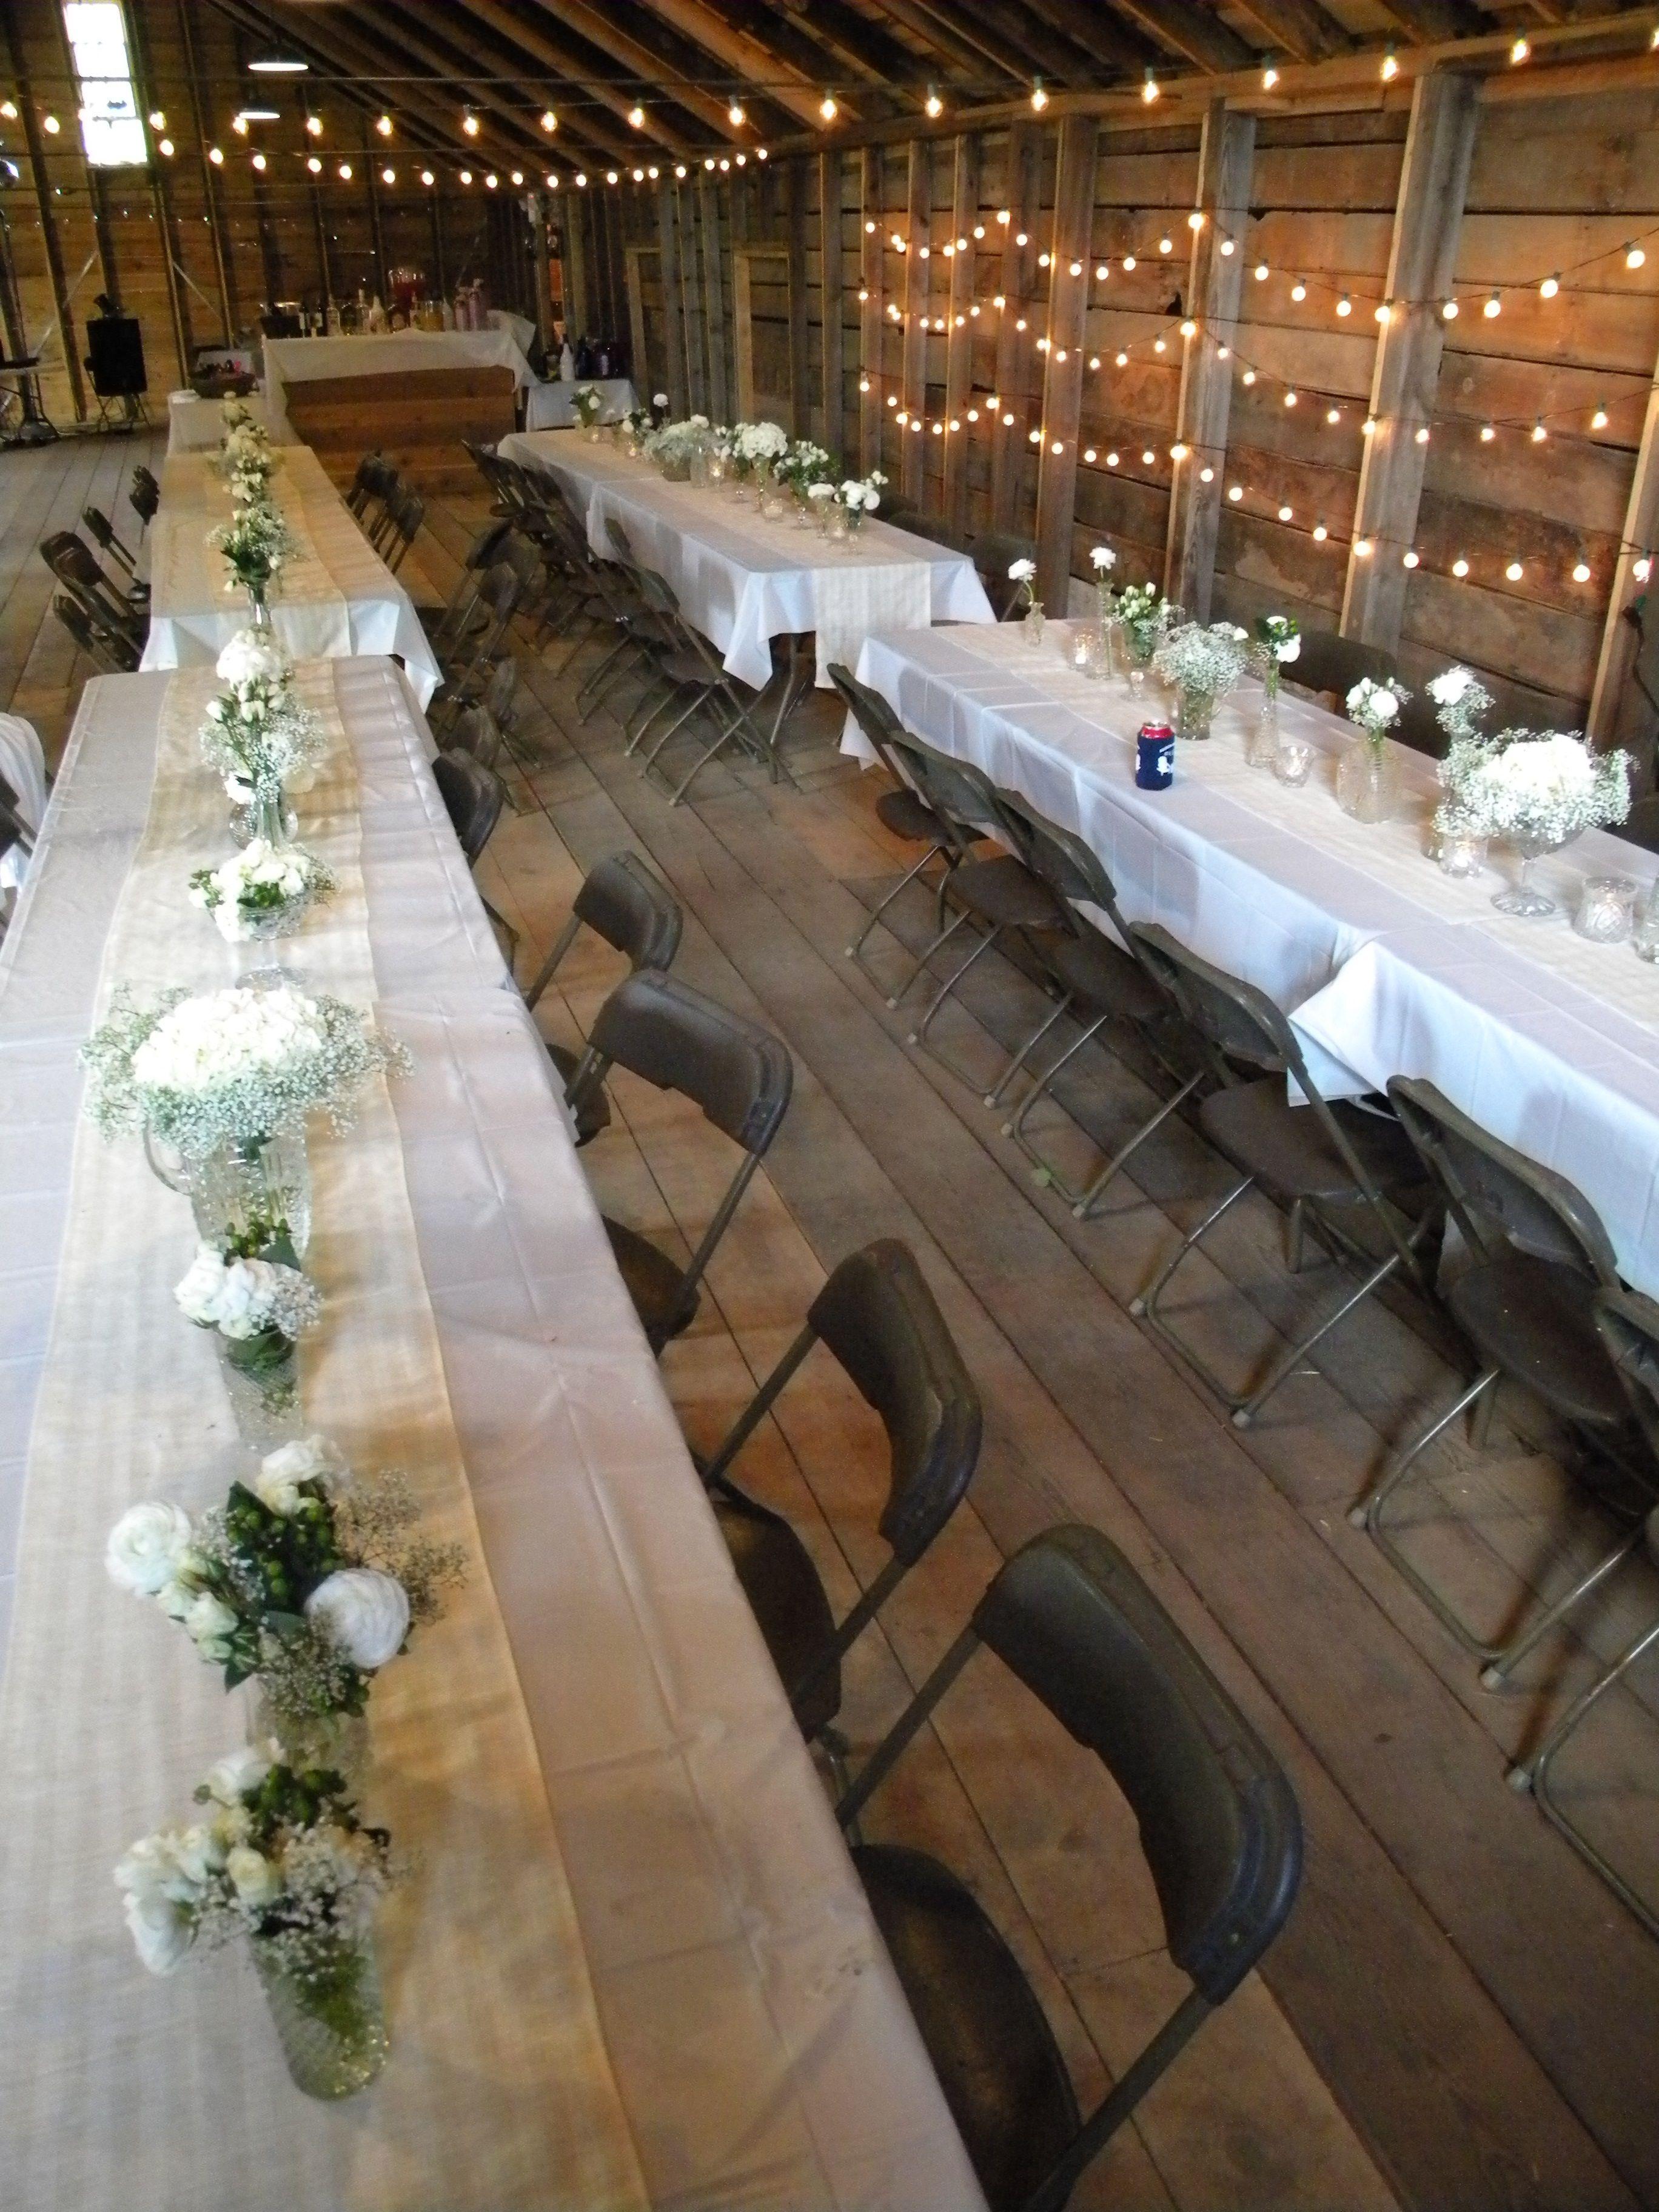 Lamborn Farm is a classic wedding venue located in